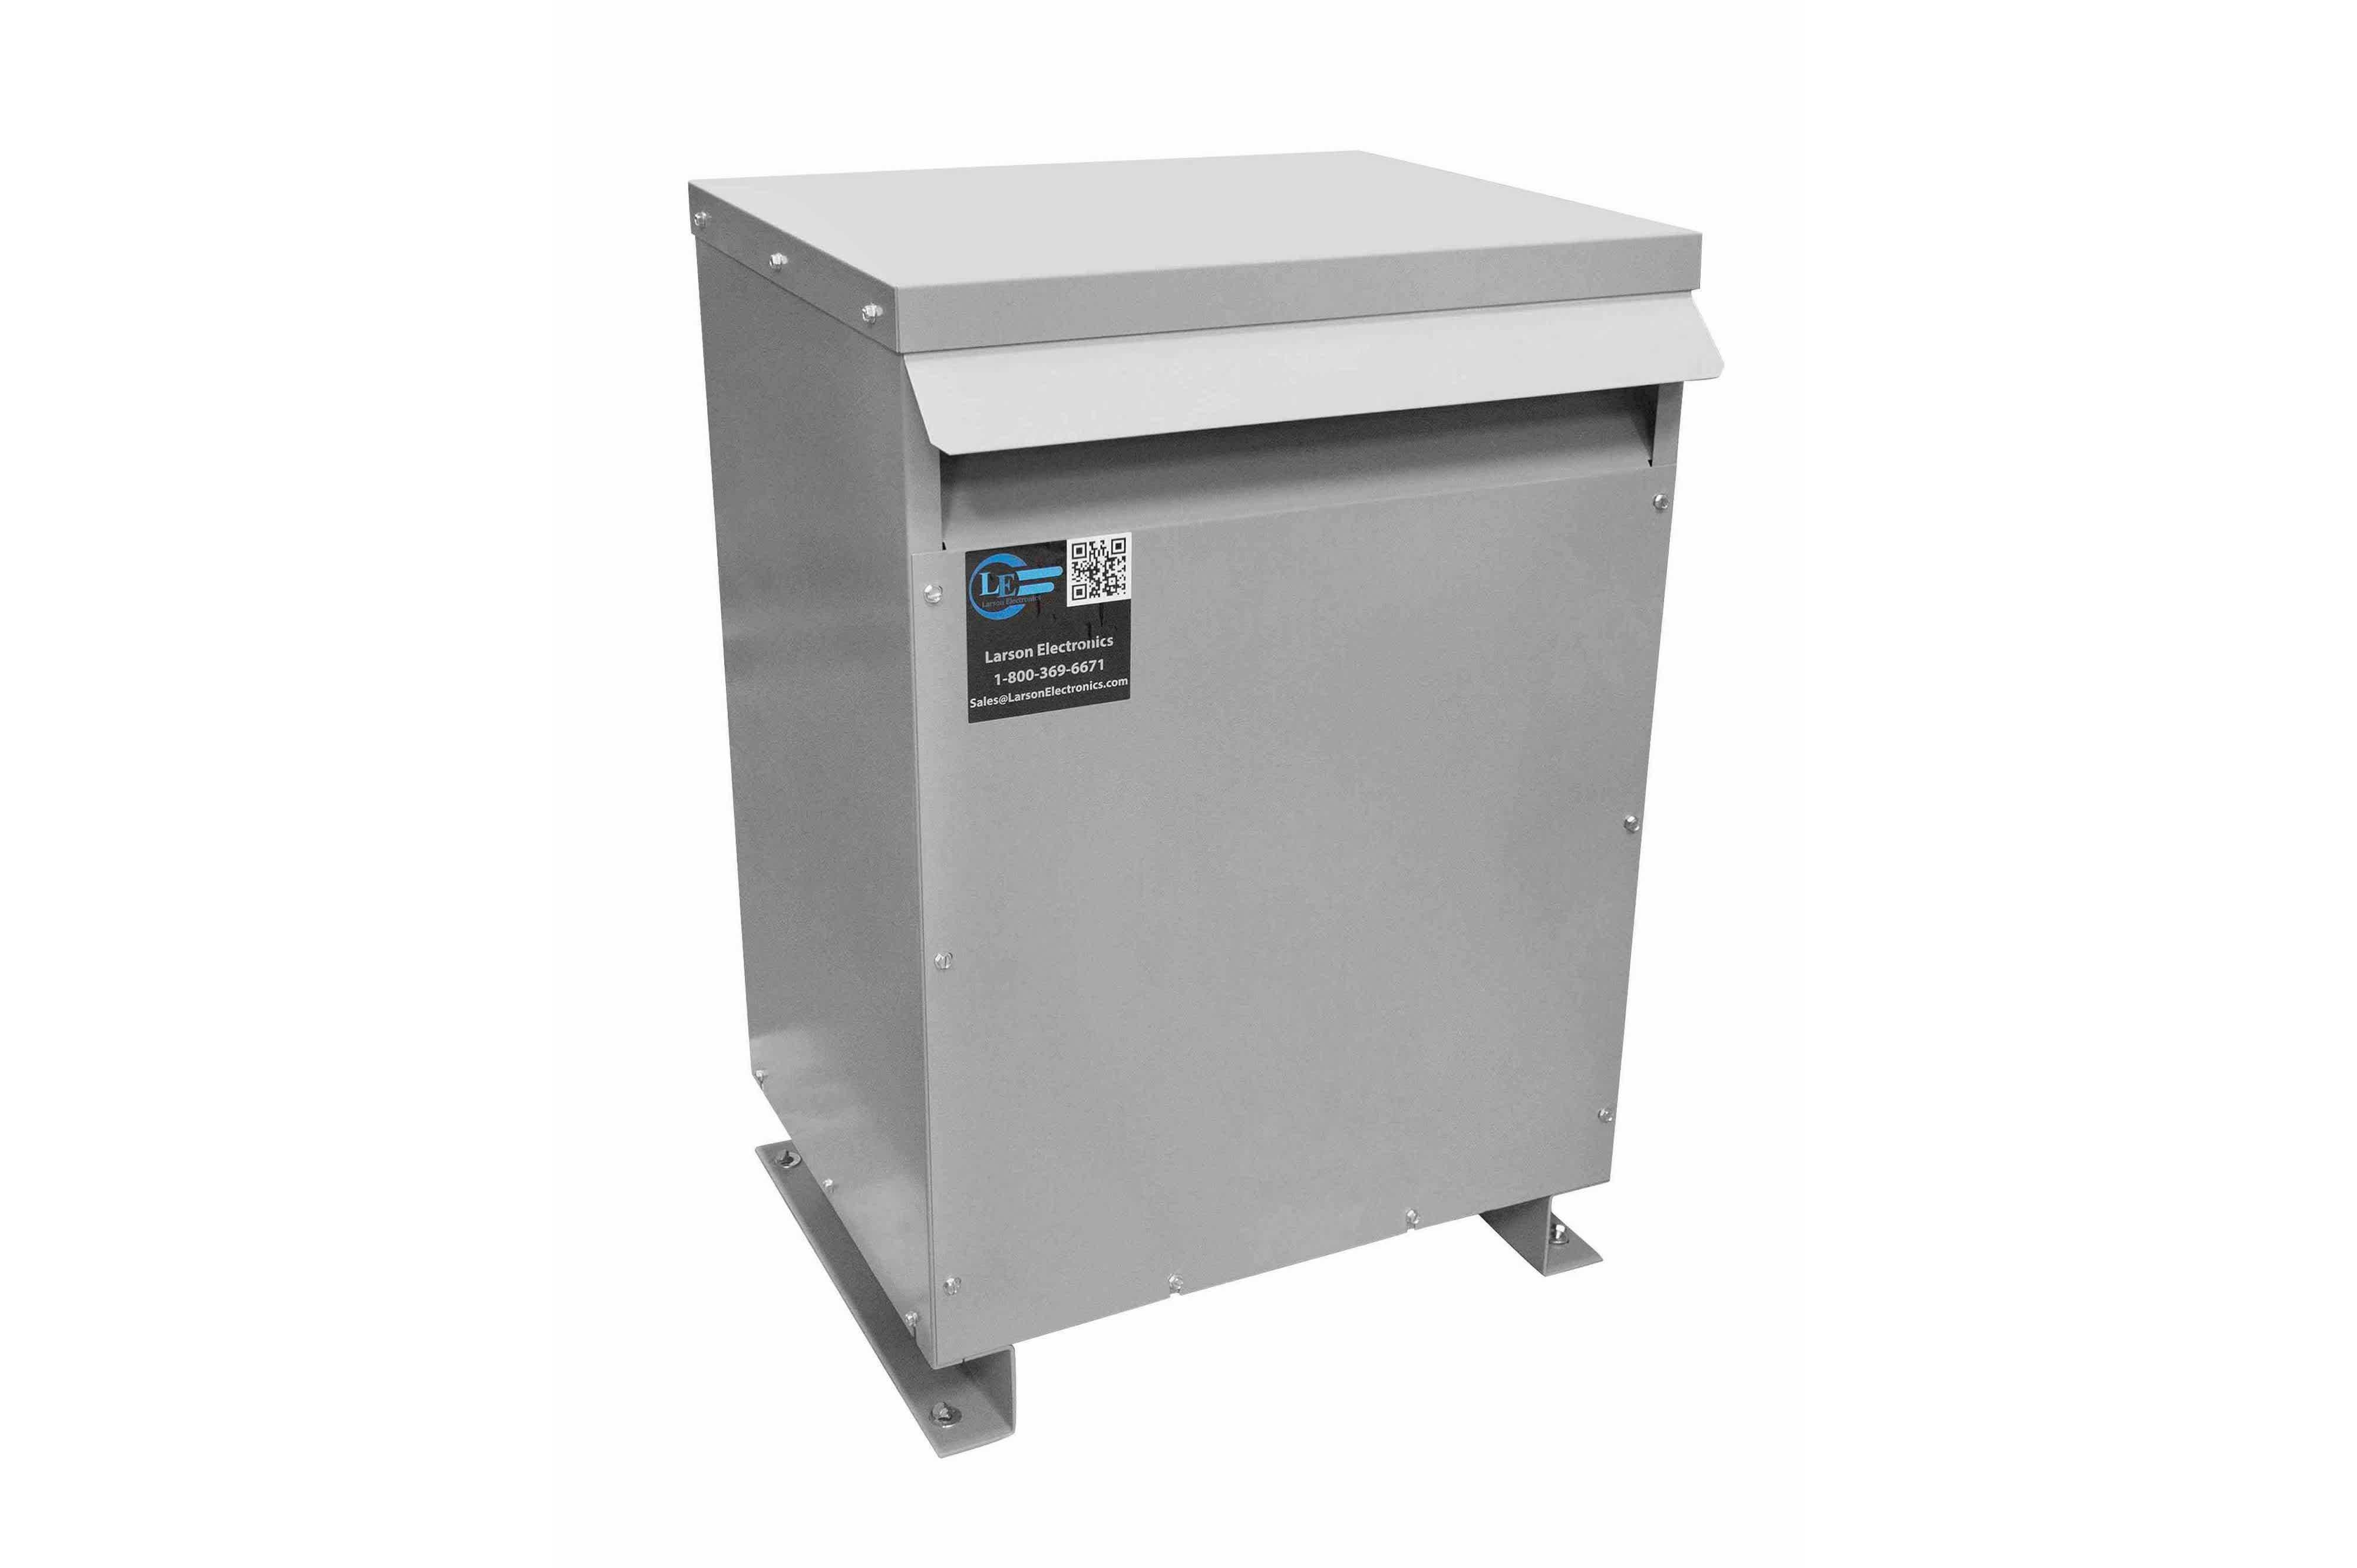 137.5 kVA 3PH Isolation Transformer, 208V Wye Primary, 480Y/277 Wye-N Secondary, N3R, Ventilated, 60 Hz